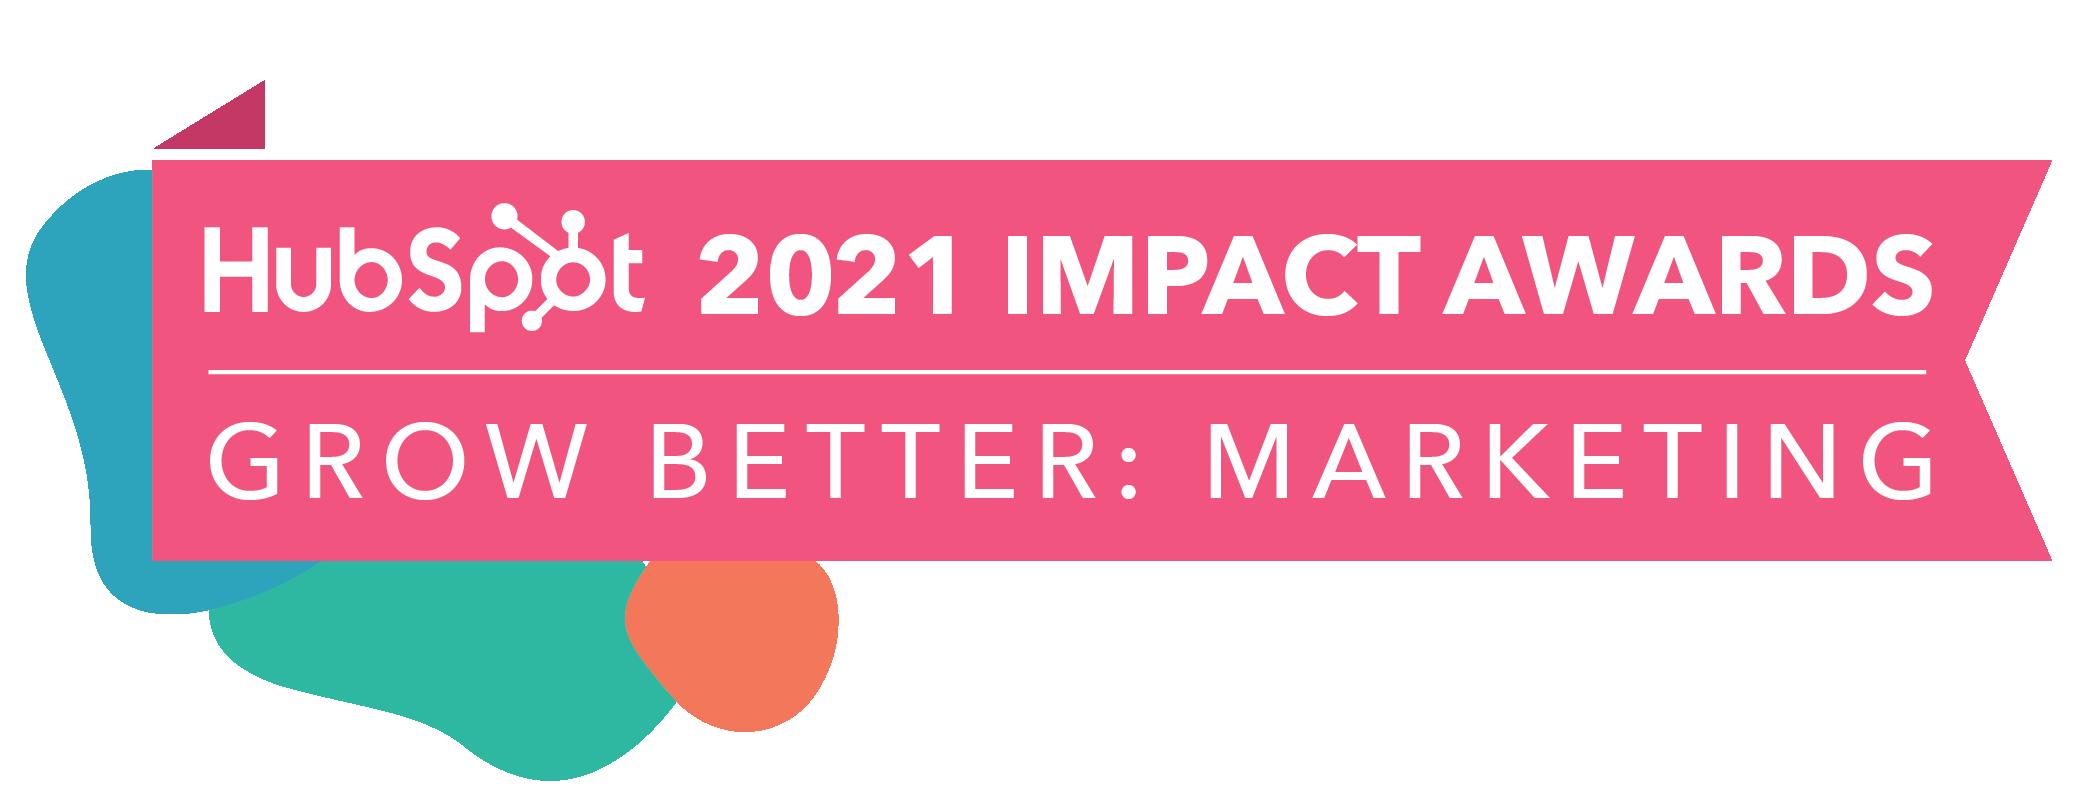 Hubspot Impact Award Marketing 2021 Q1